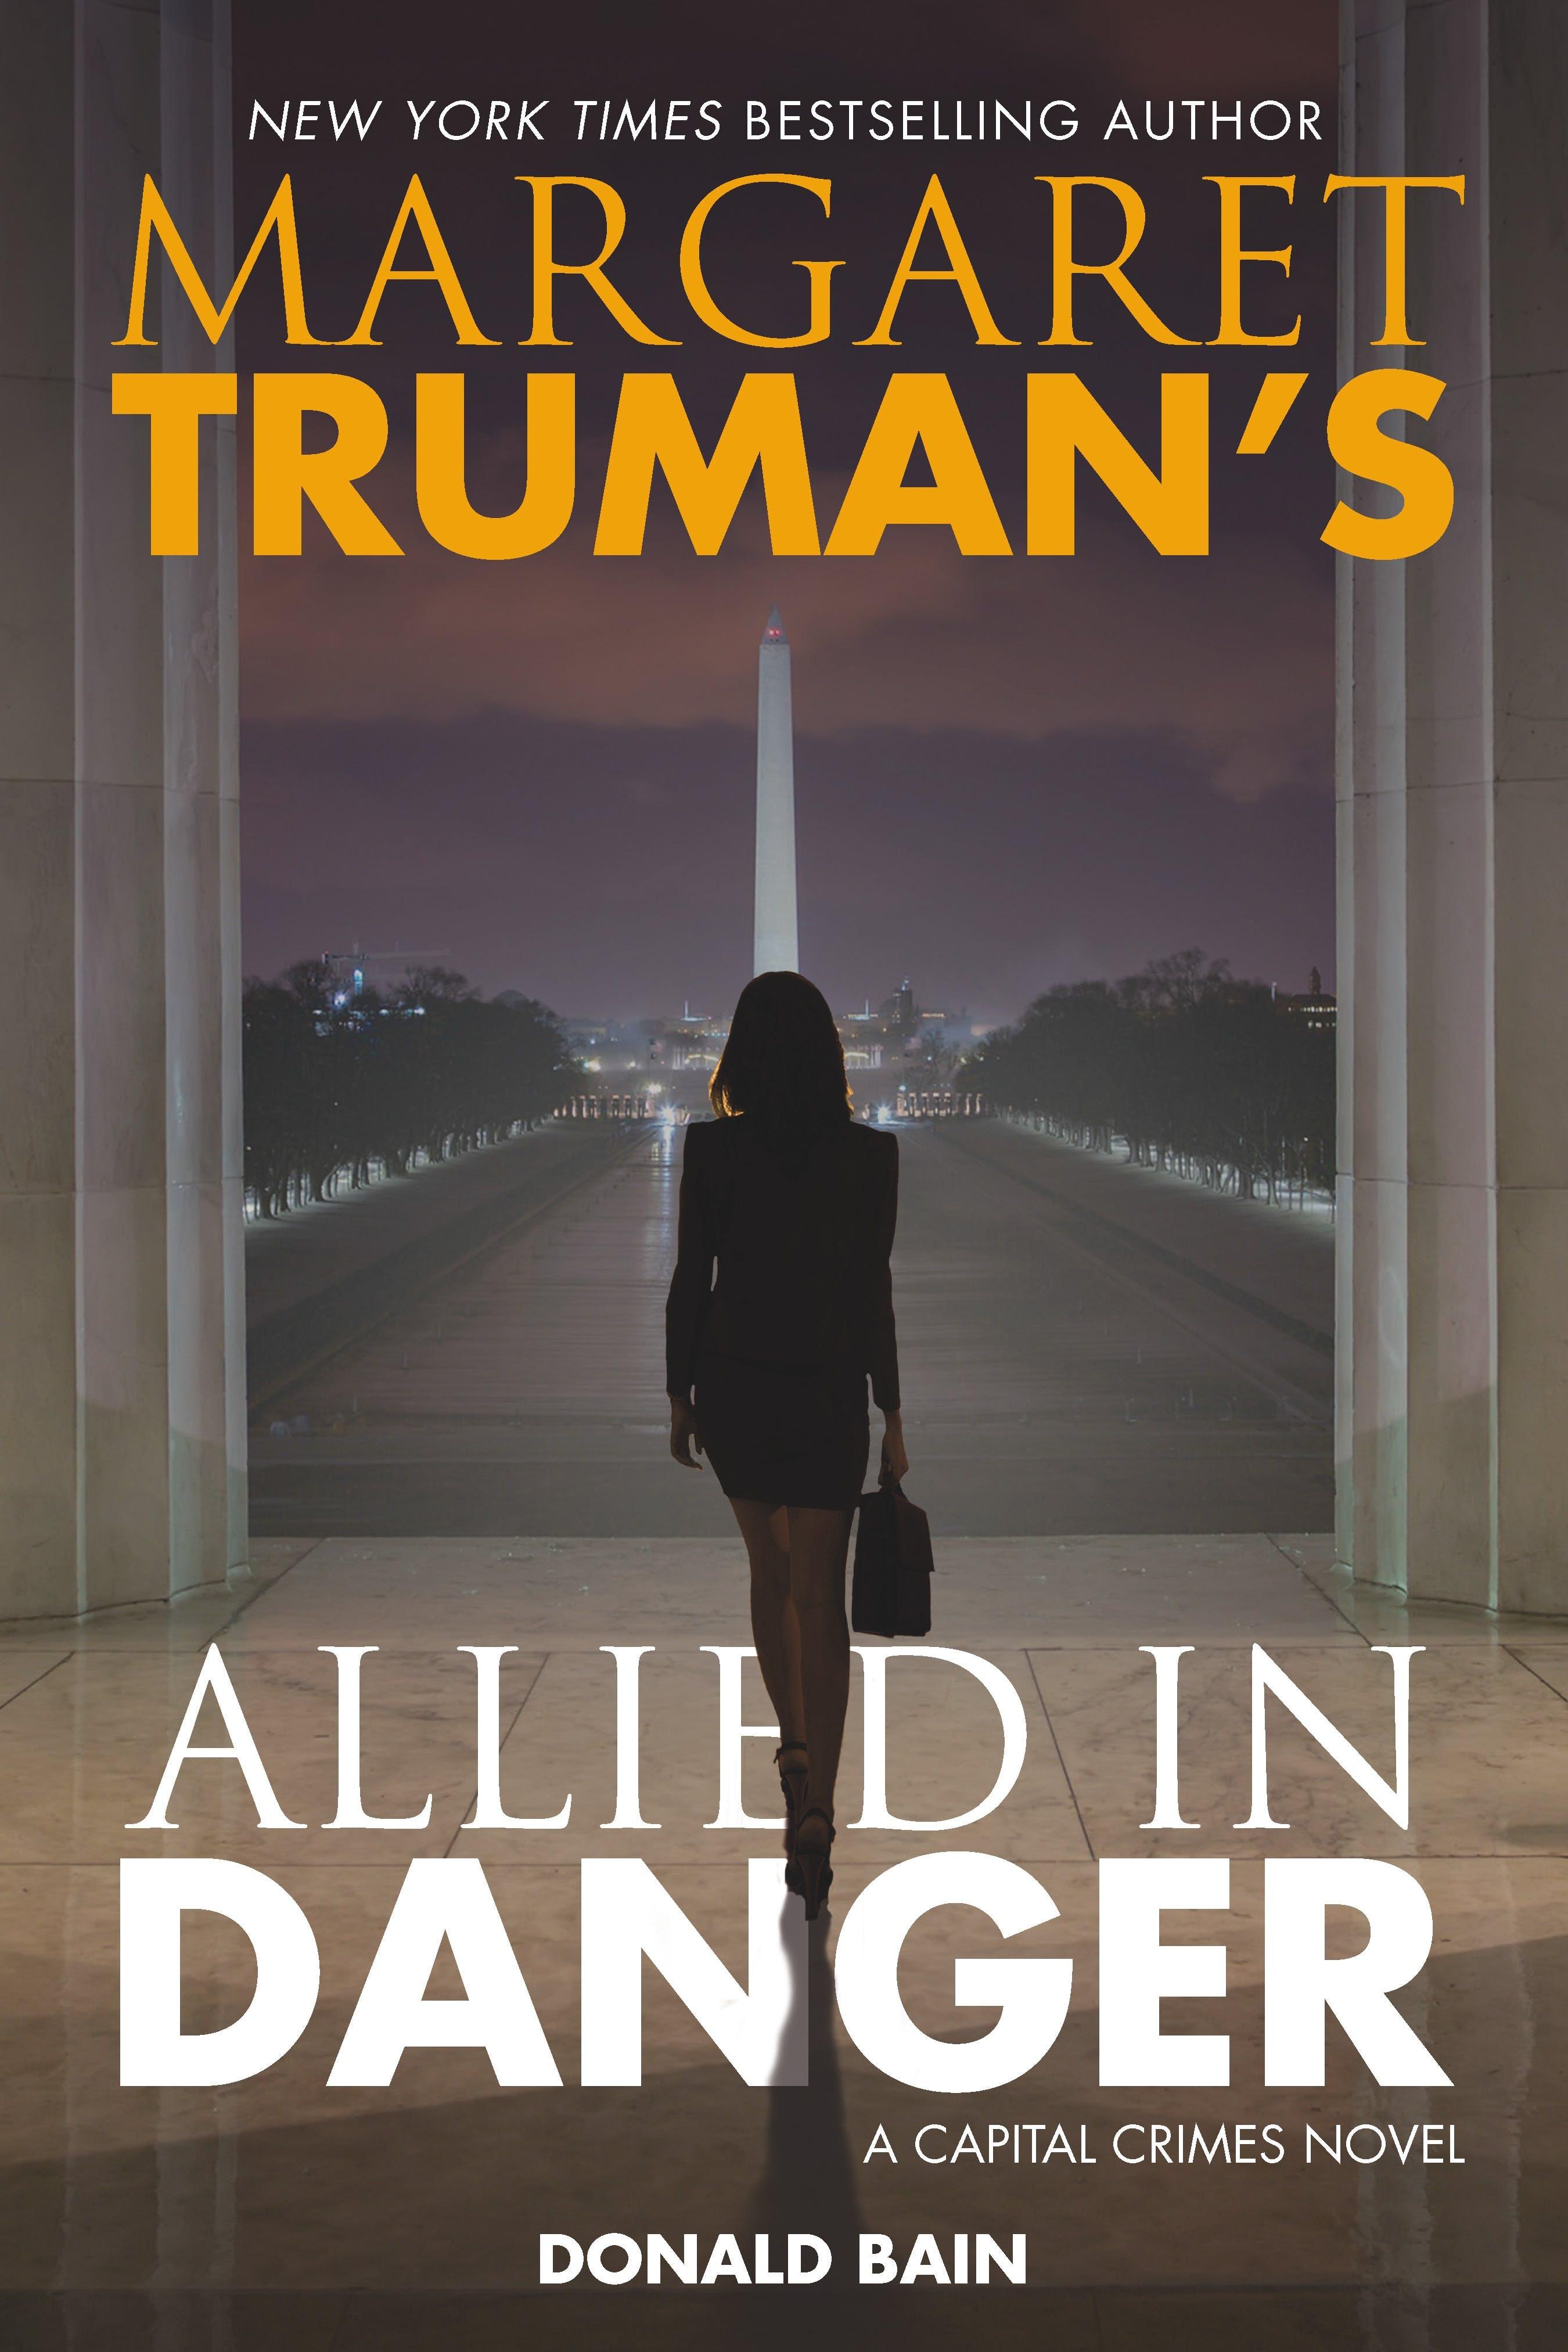 Image of Margaret Truman's Allied in Danger